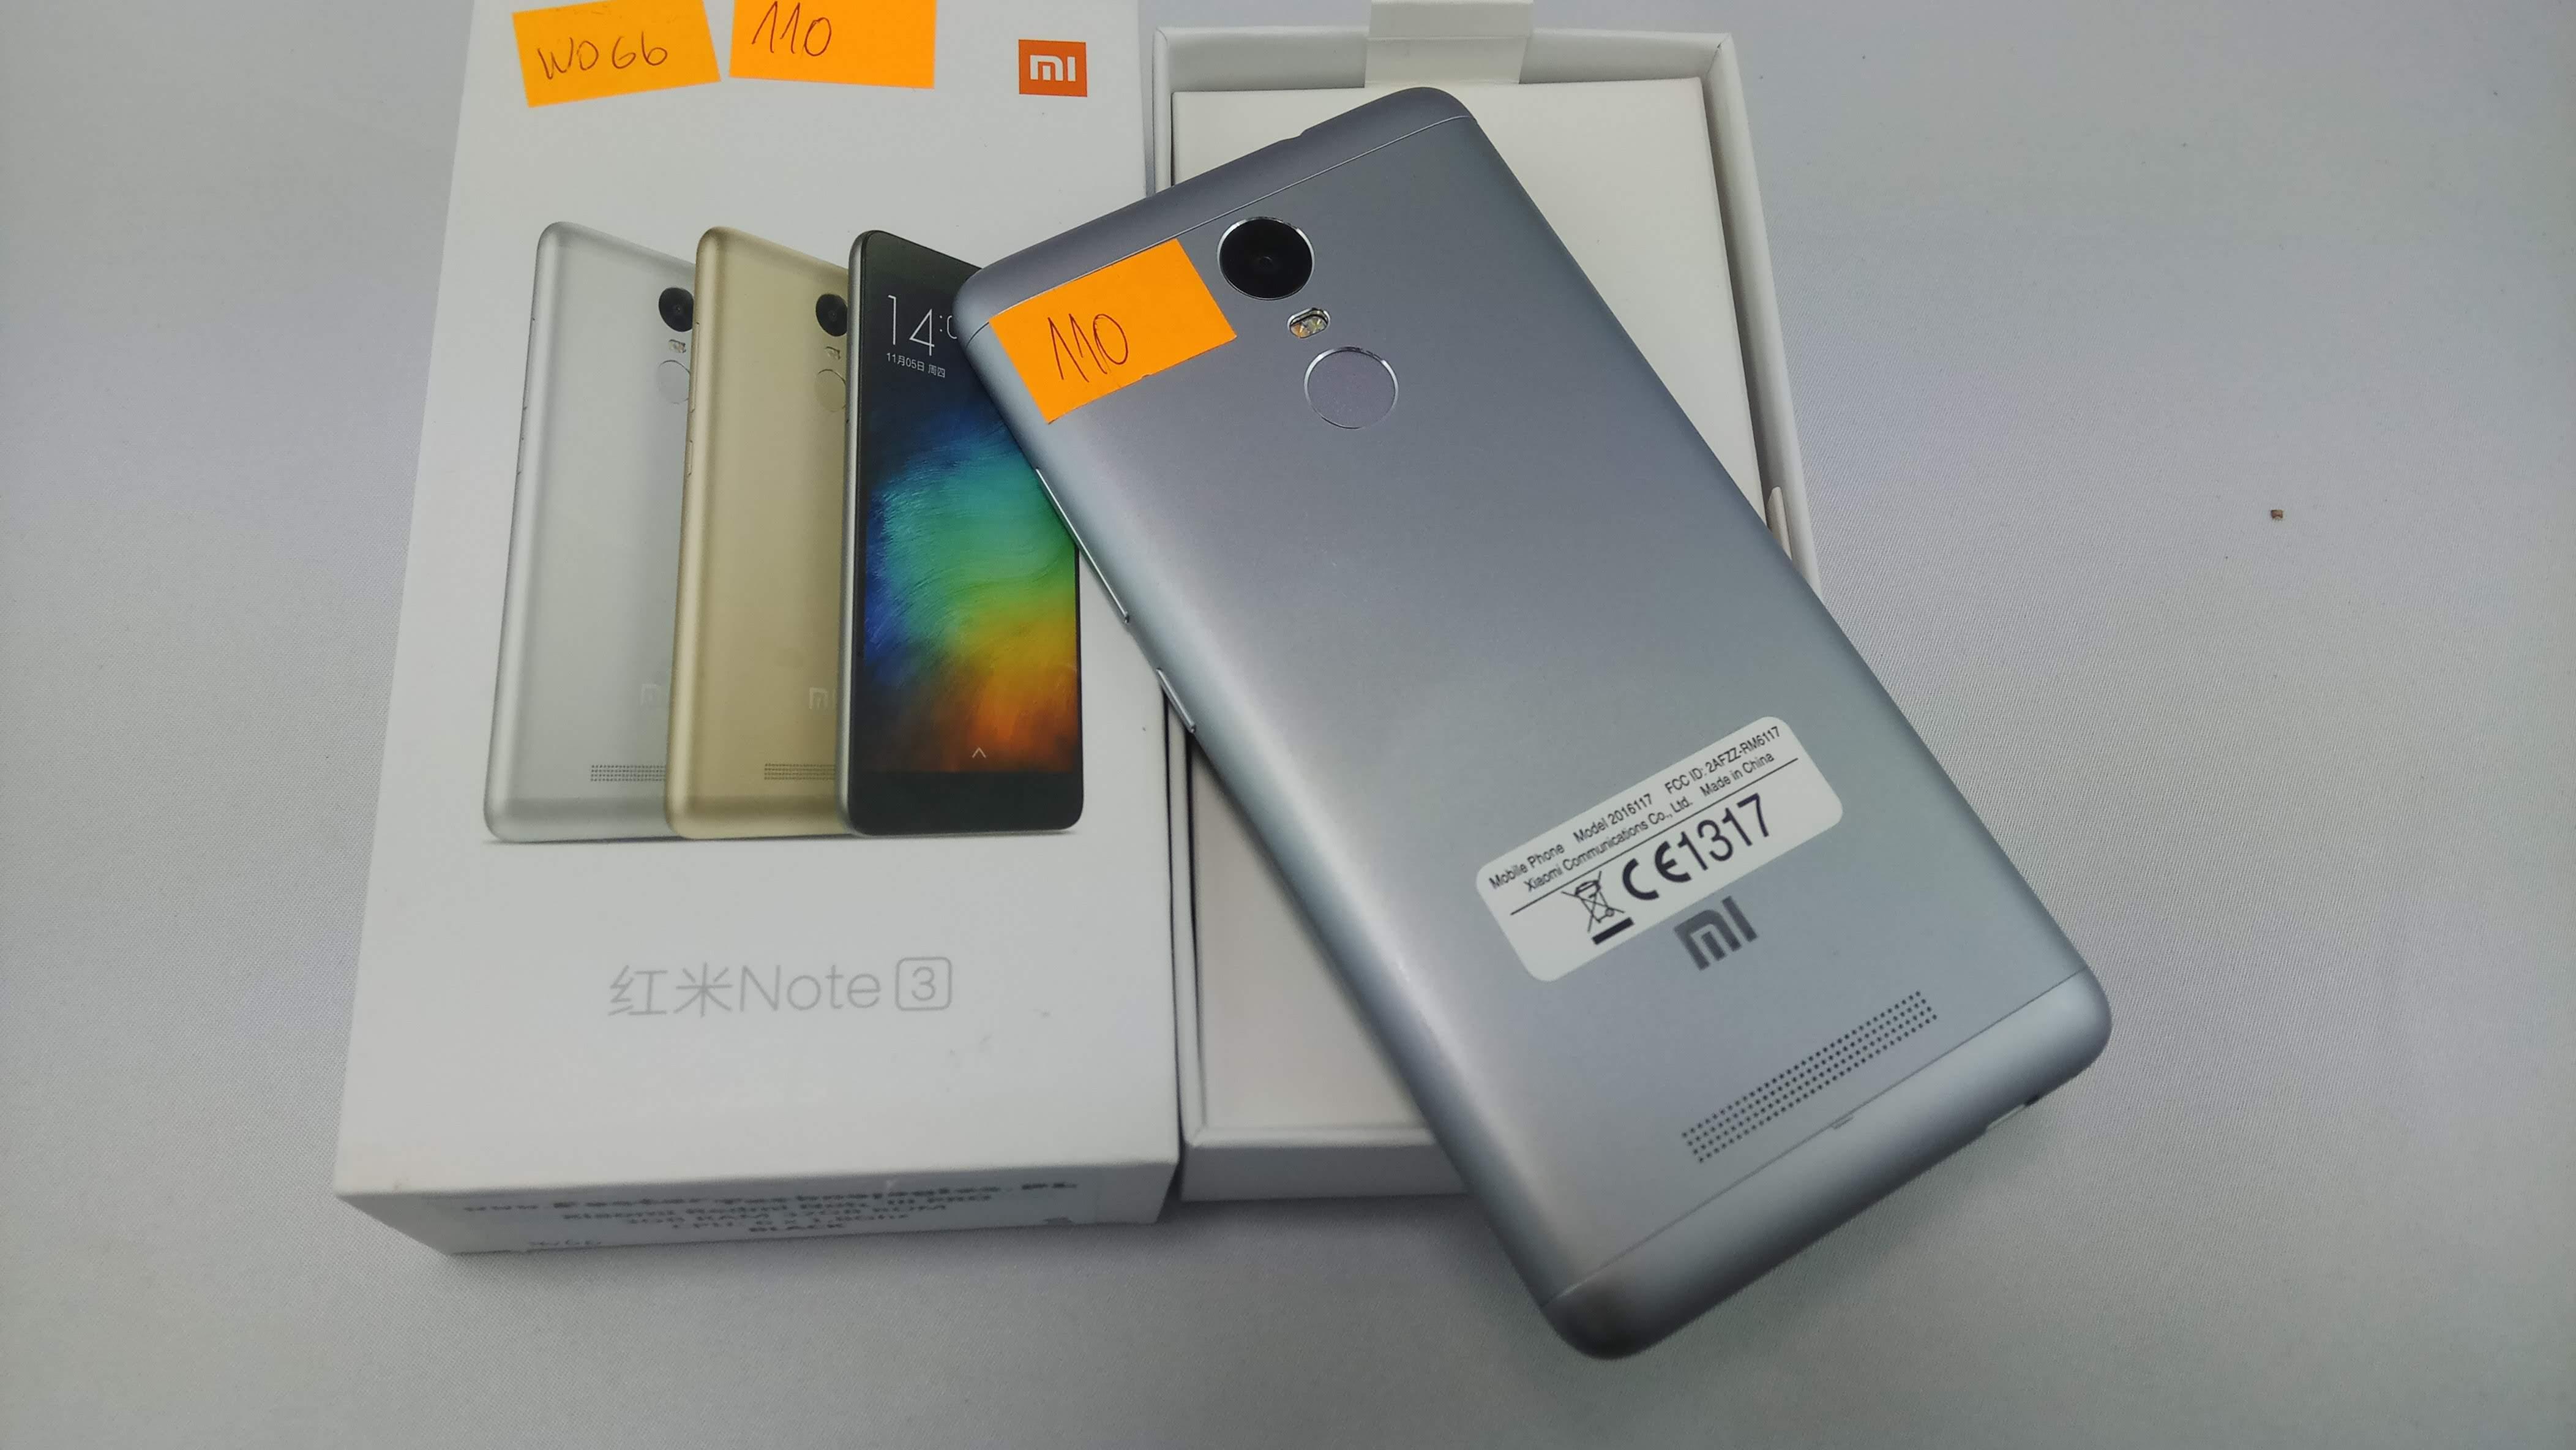 110 Xiaomi Redmi Note 3 Pro 32 Gb Czarny Outlet Foster Technologies Grey Img 20180619 155455 155501